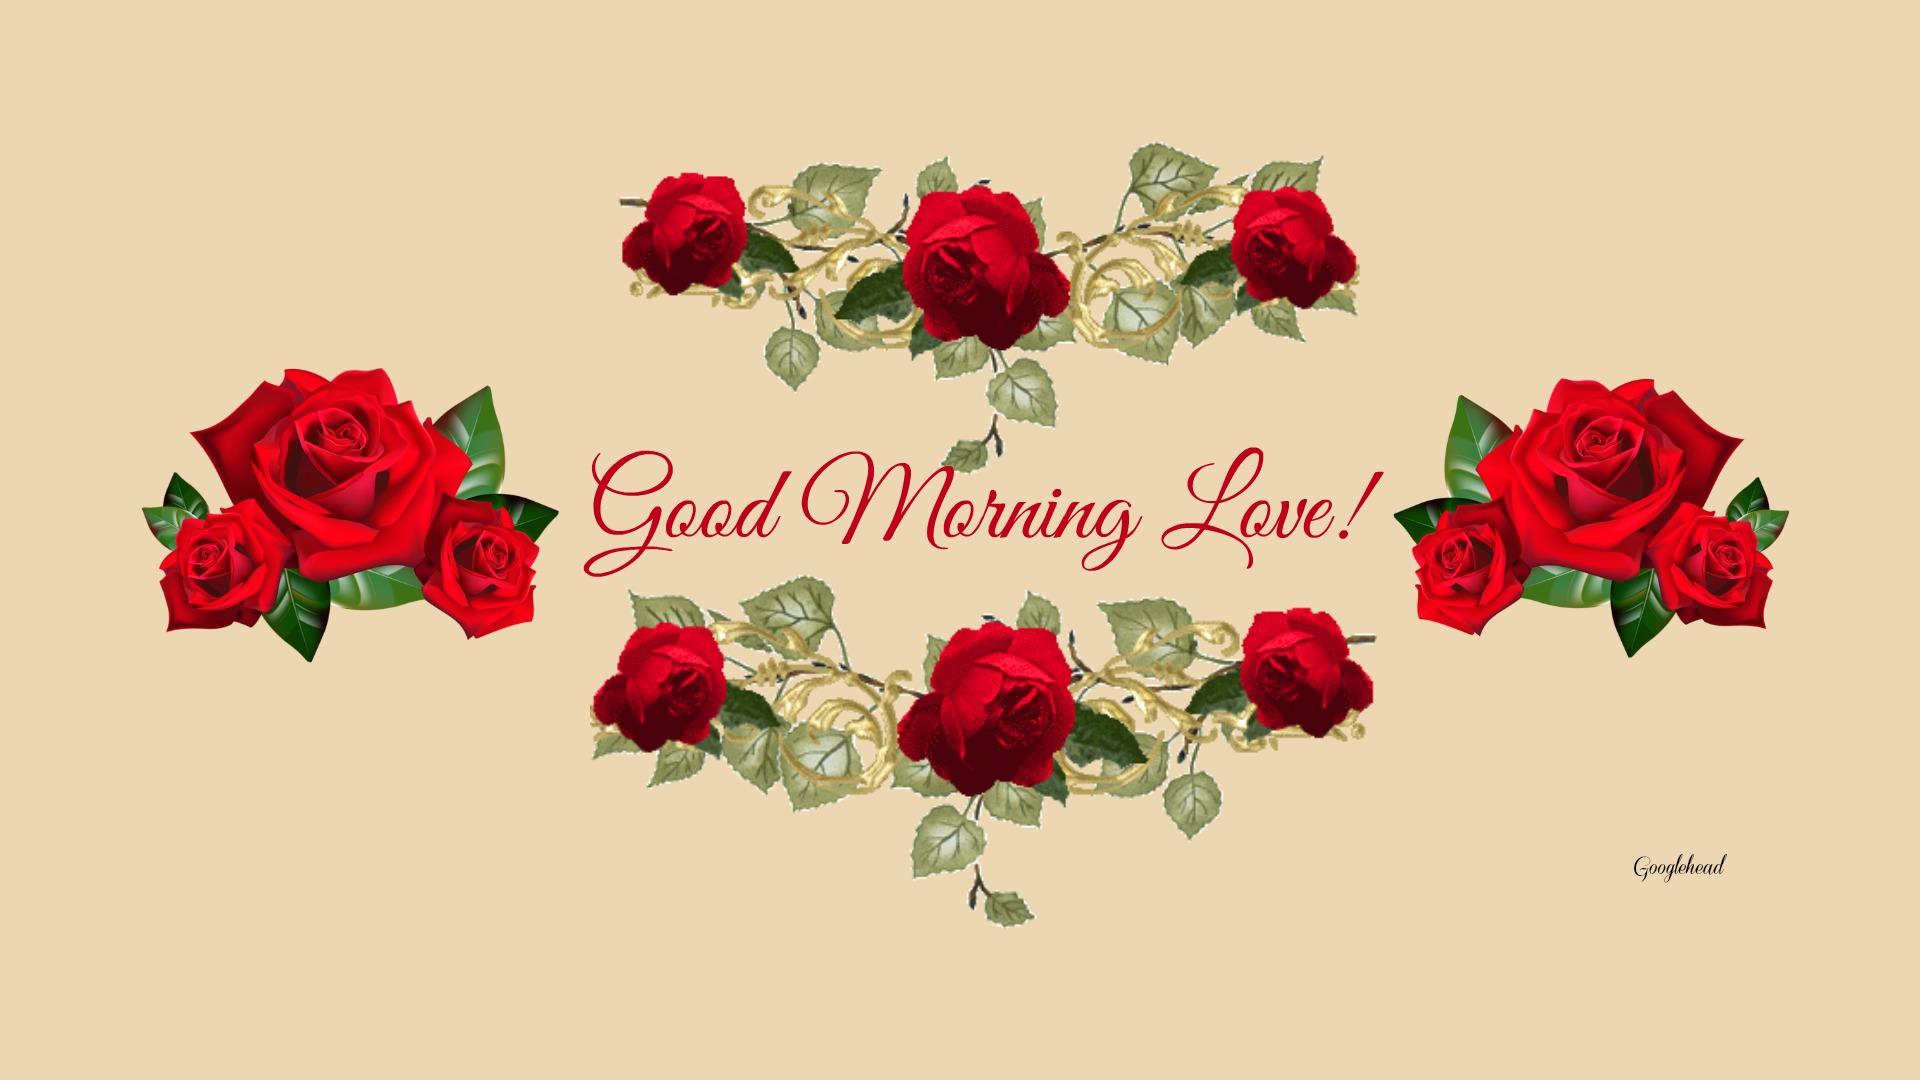 Good Morning Images Allwishes Good Morning Animated Gif Images